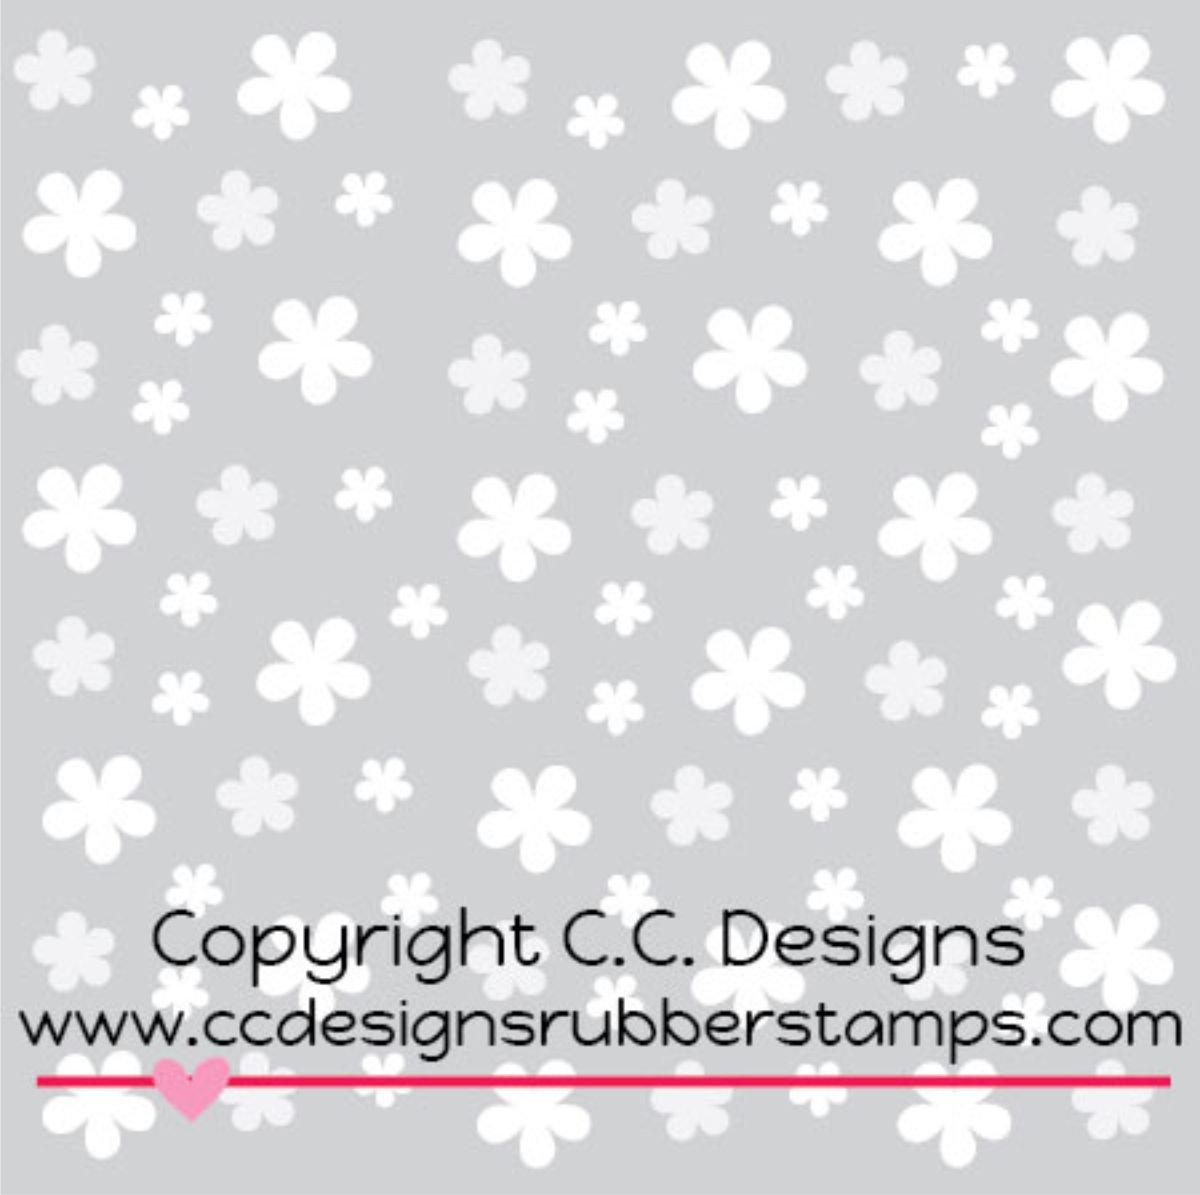 C.C. thiết kế mẫu 6